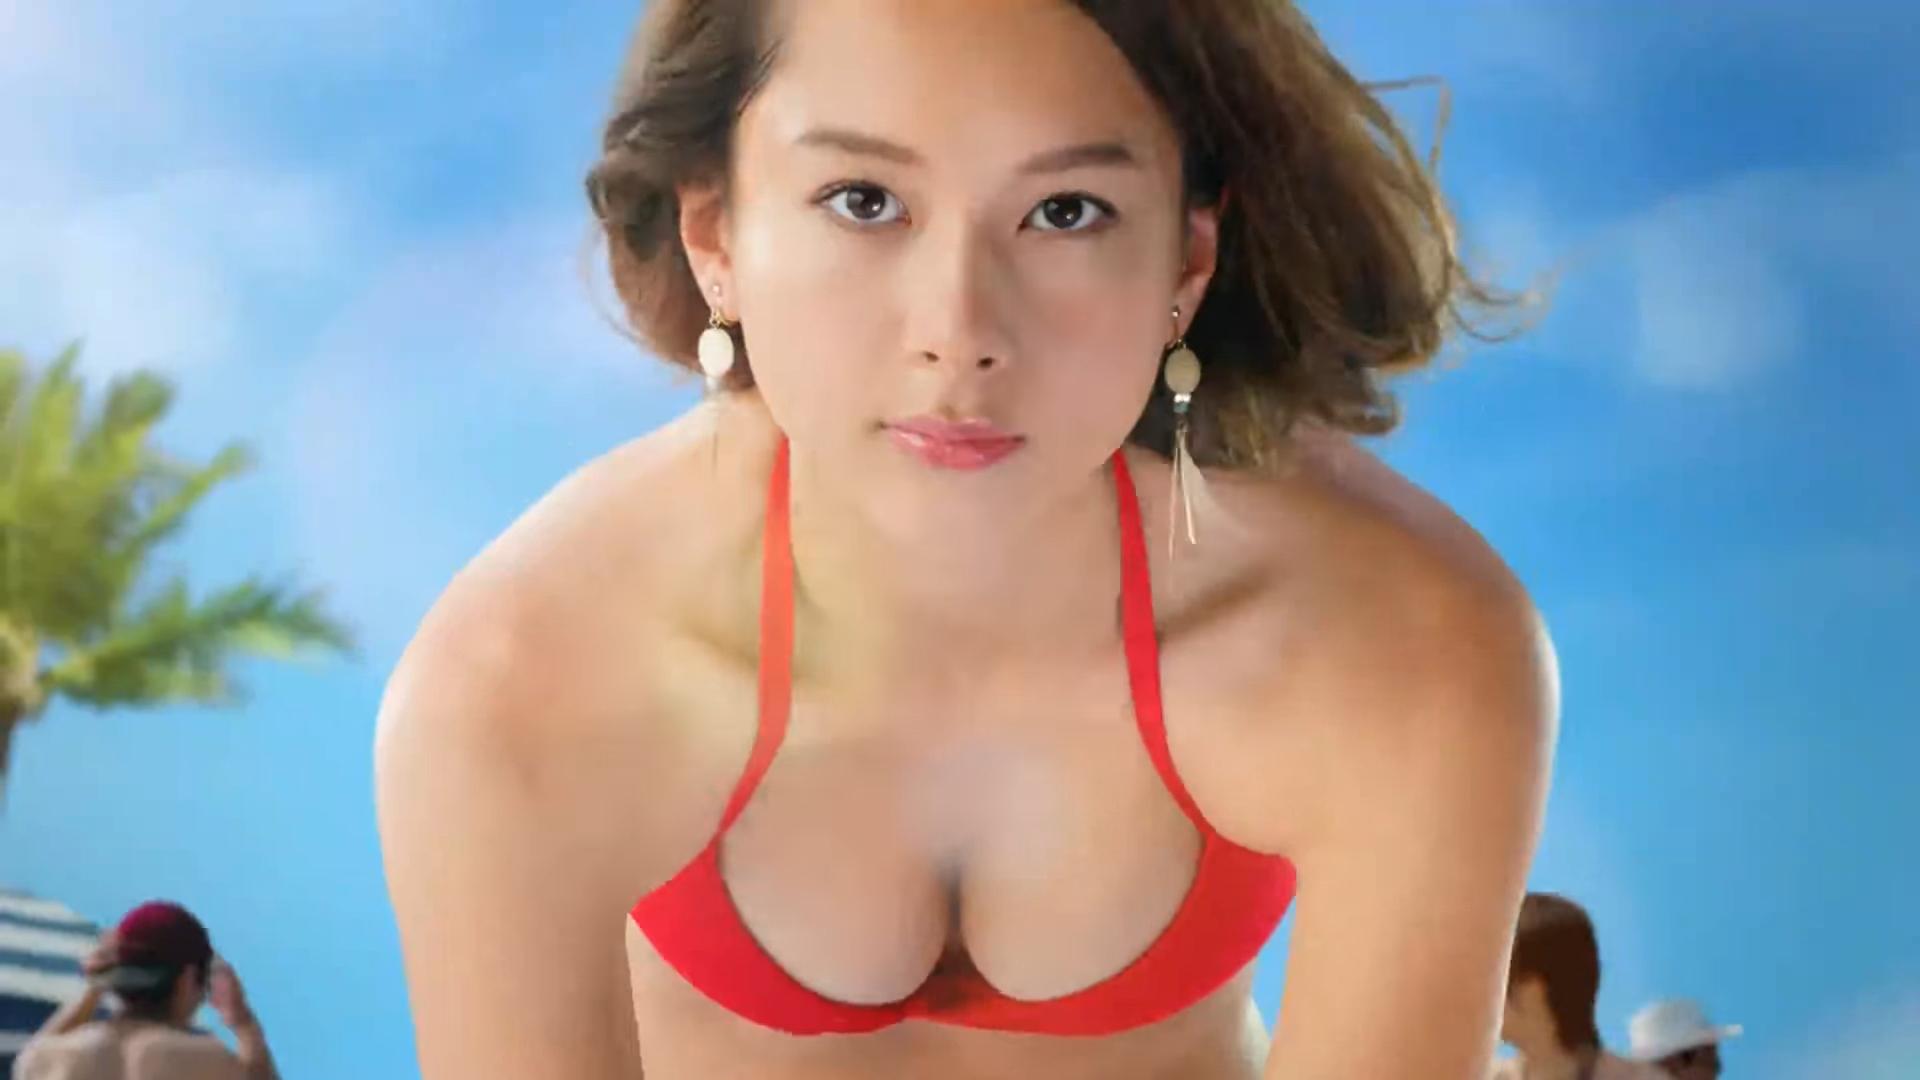 Niki(丹羽仁希)のヌード・水着グラビア等抜けるエロ画像110枚・48枚目の画像